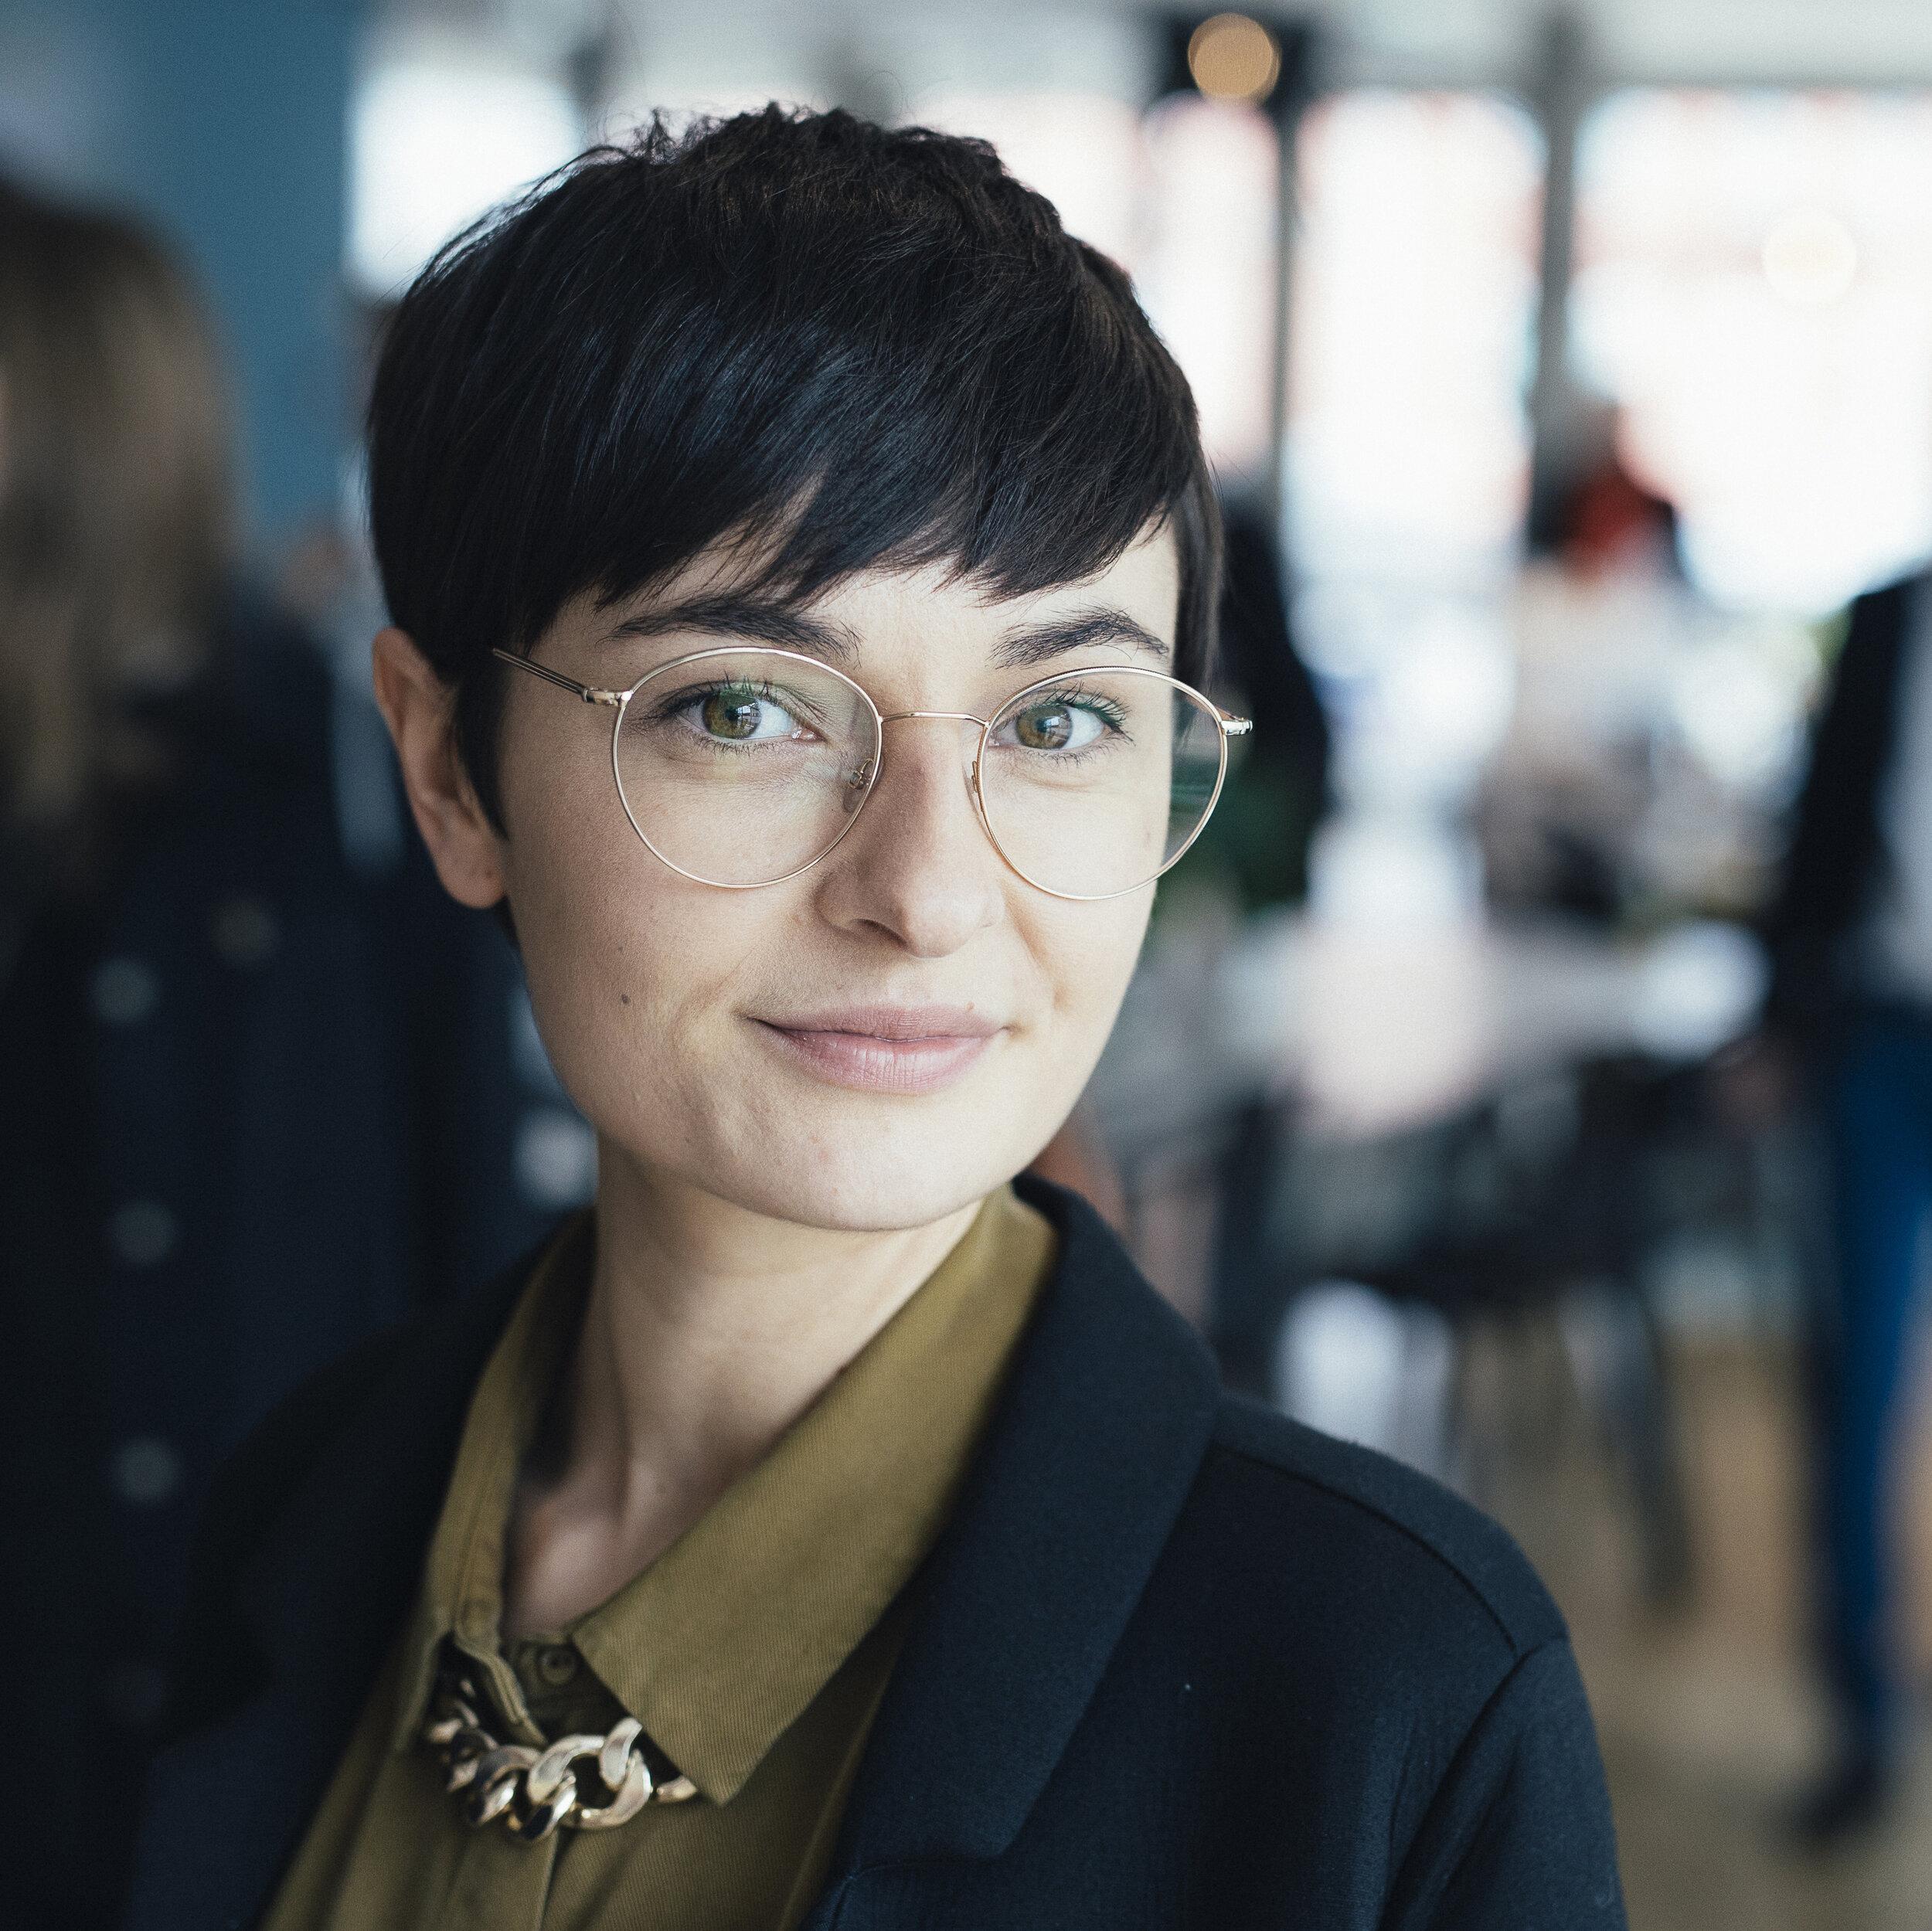 Karin Schmerda (c) Marija Kanizaj_square.jpg